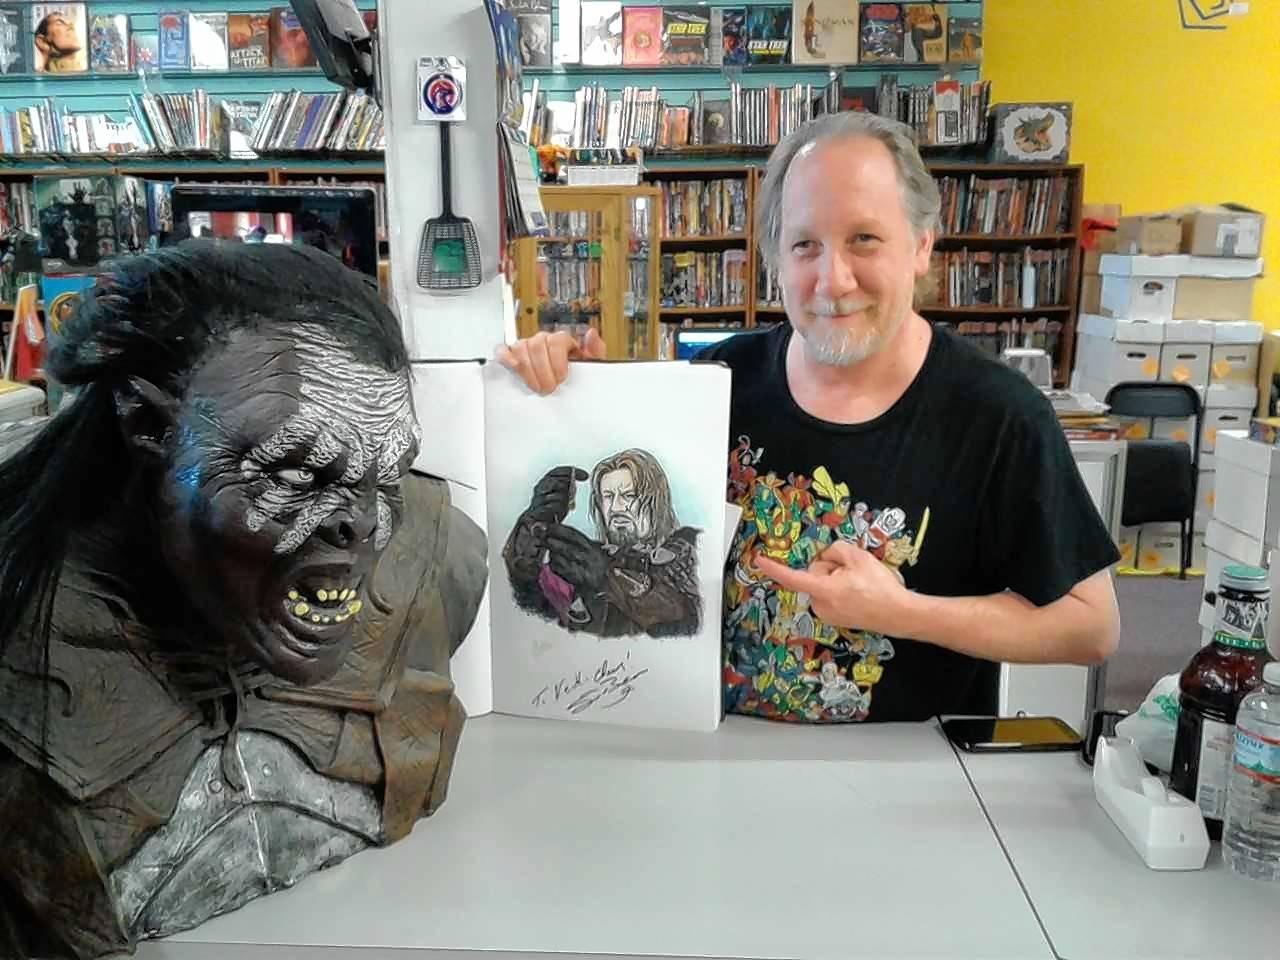 Mount harass comic book adult